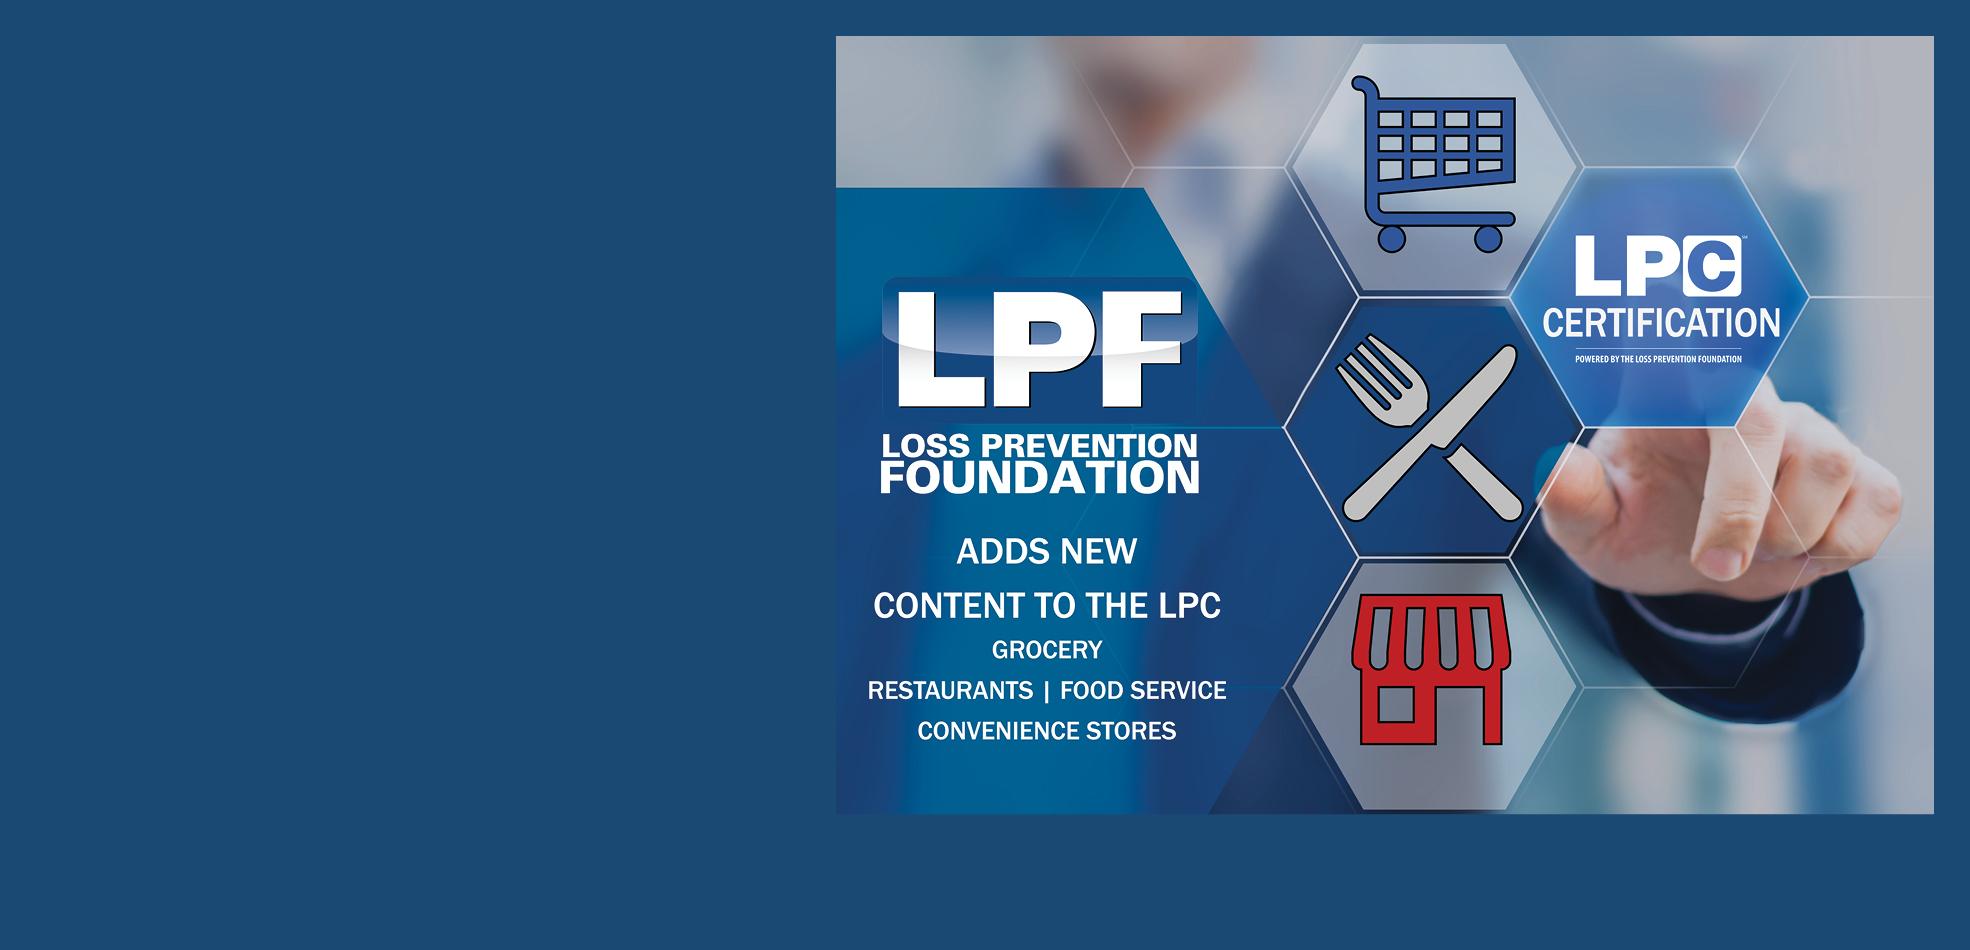 New LPC Content